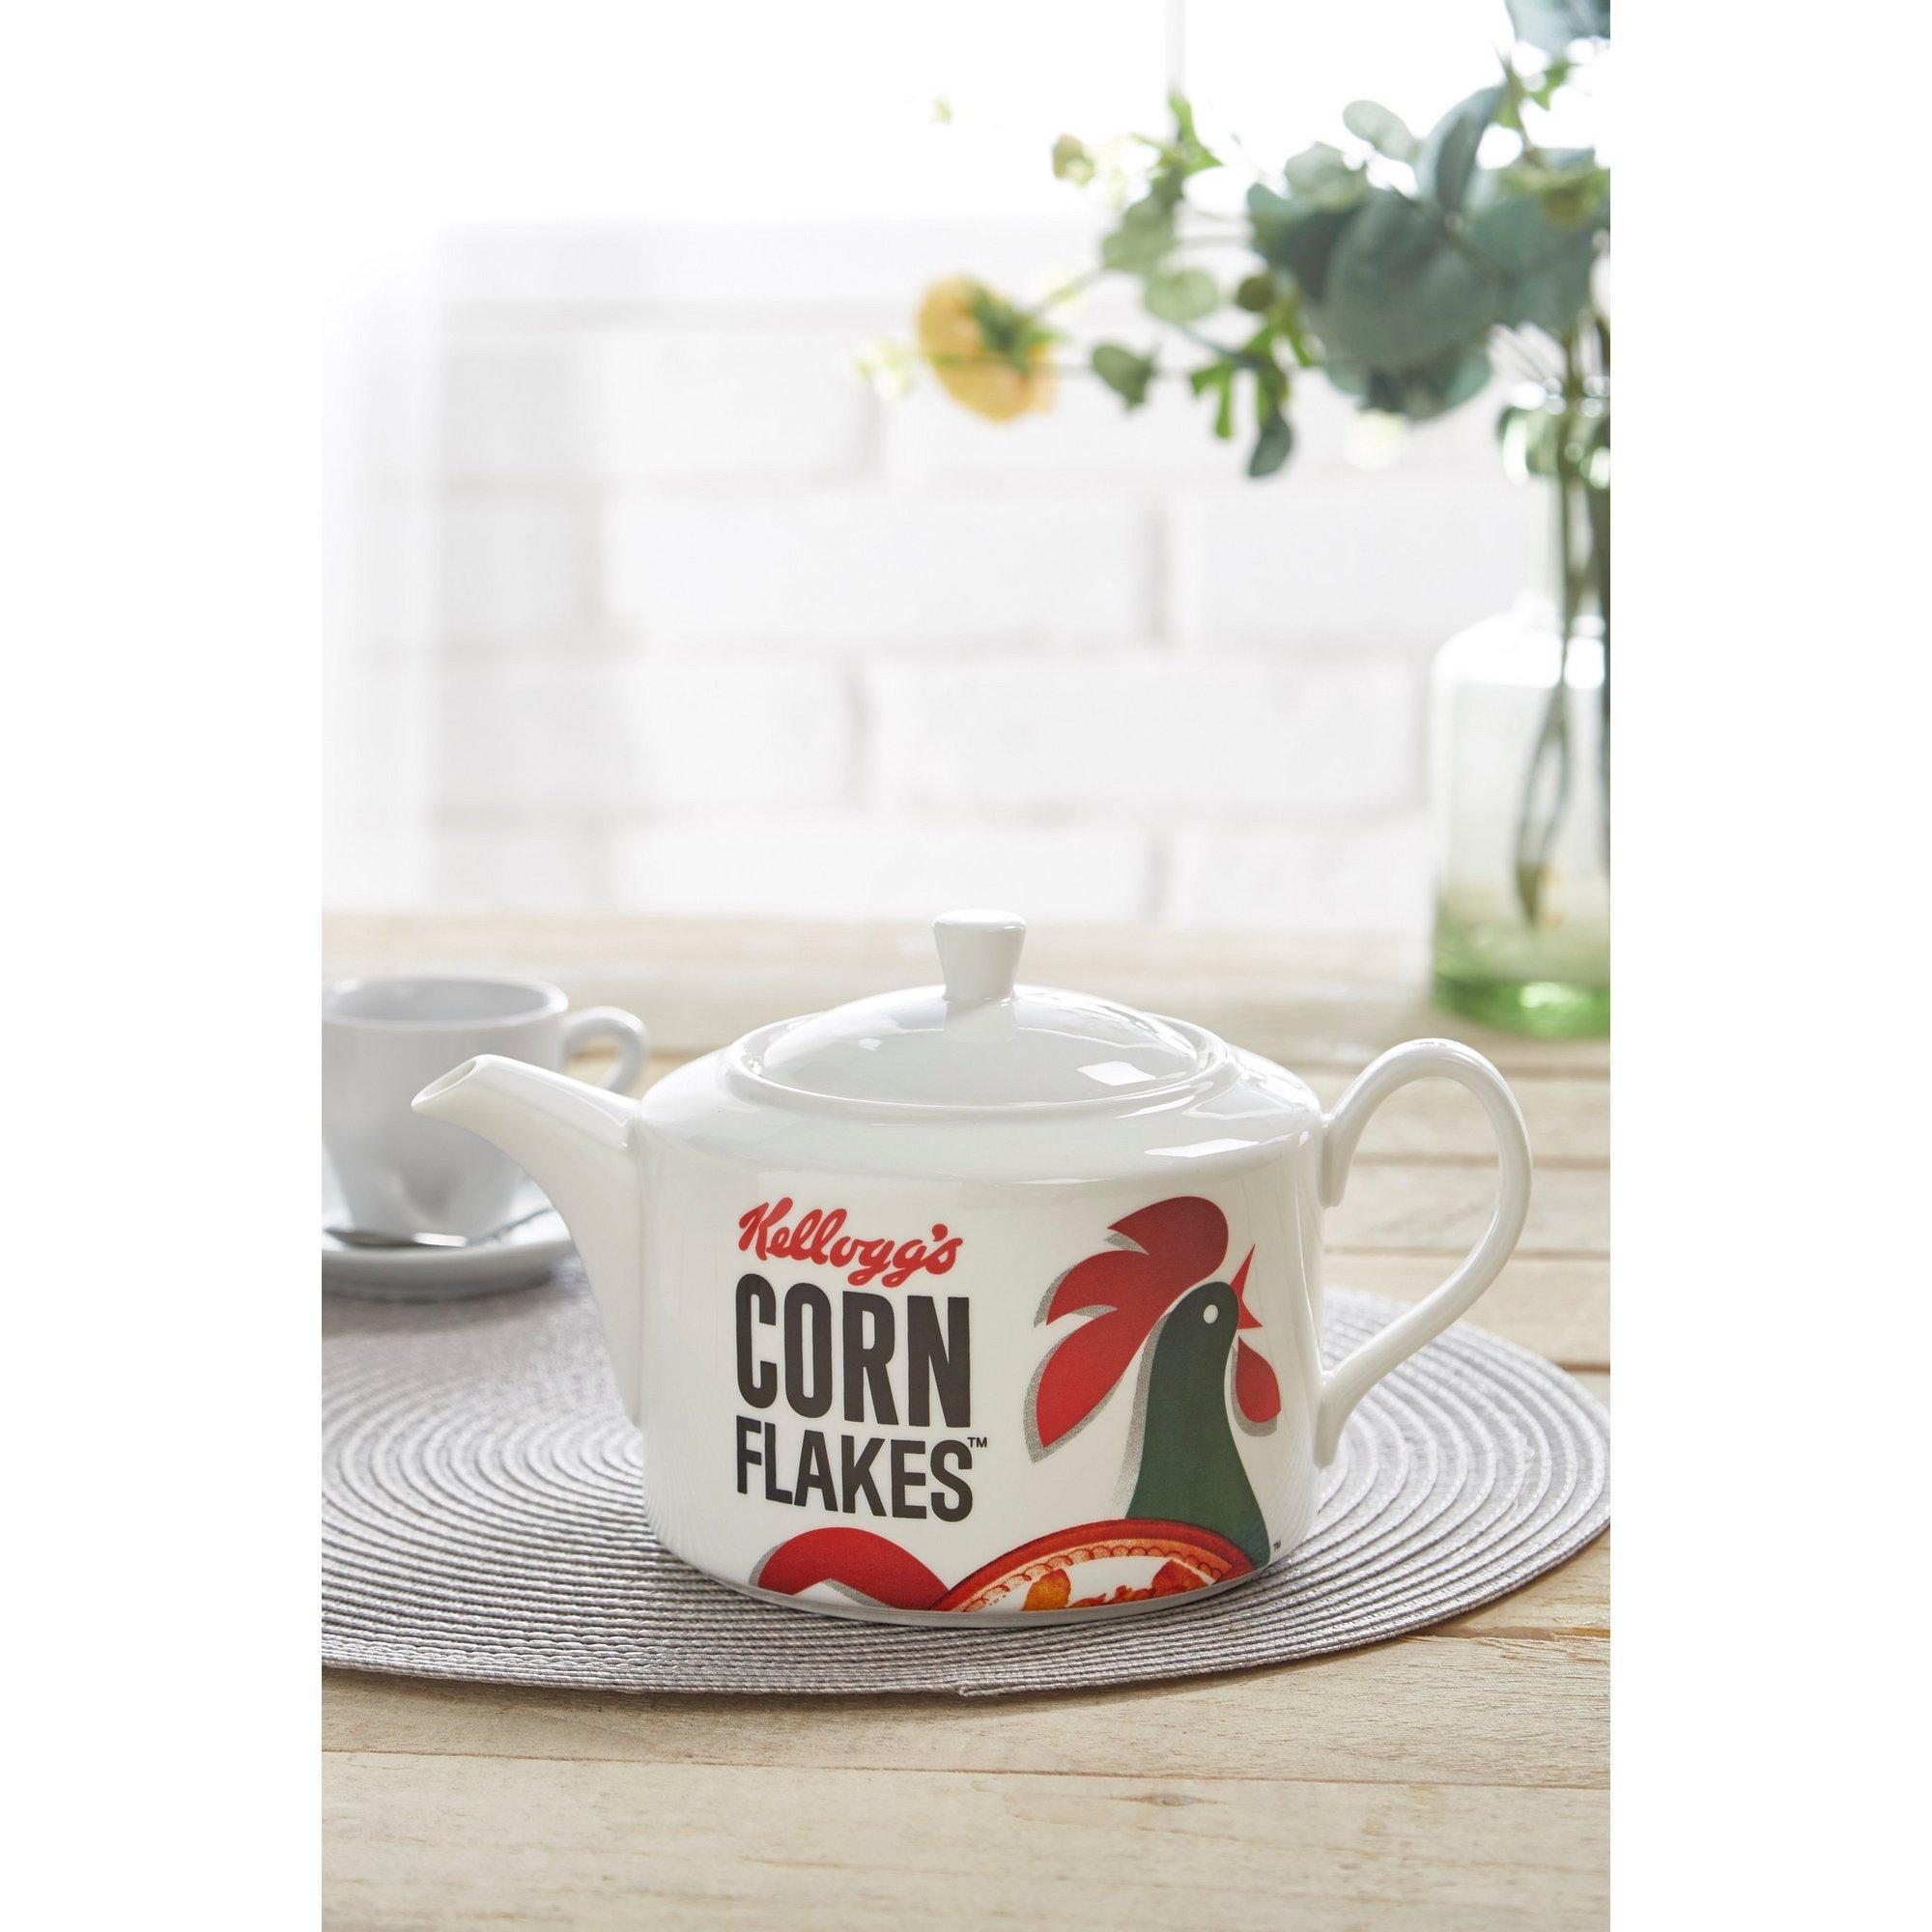 Image of Kelloggs Corn Flakes Porcelain Teapot